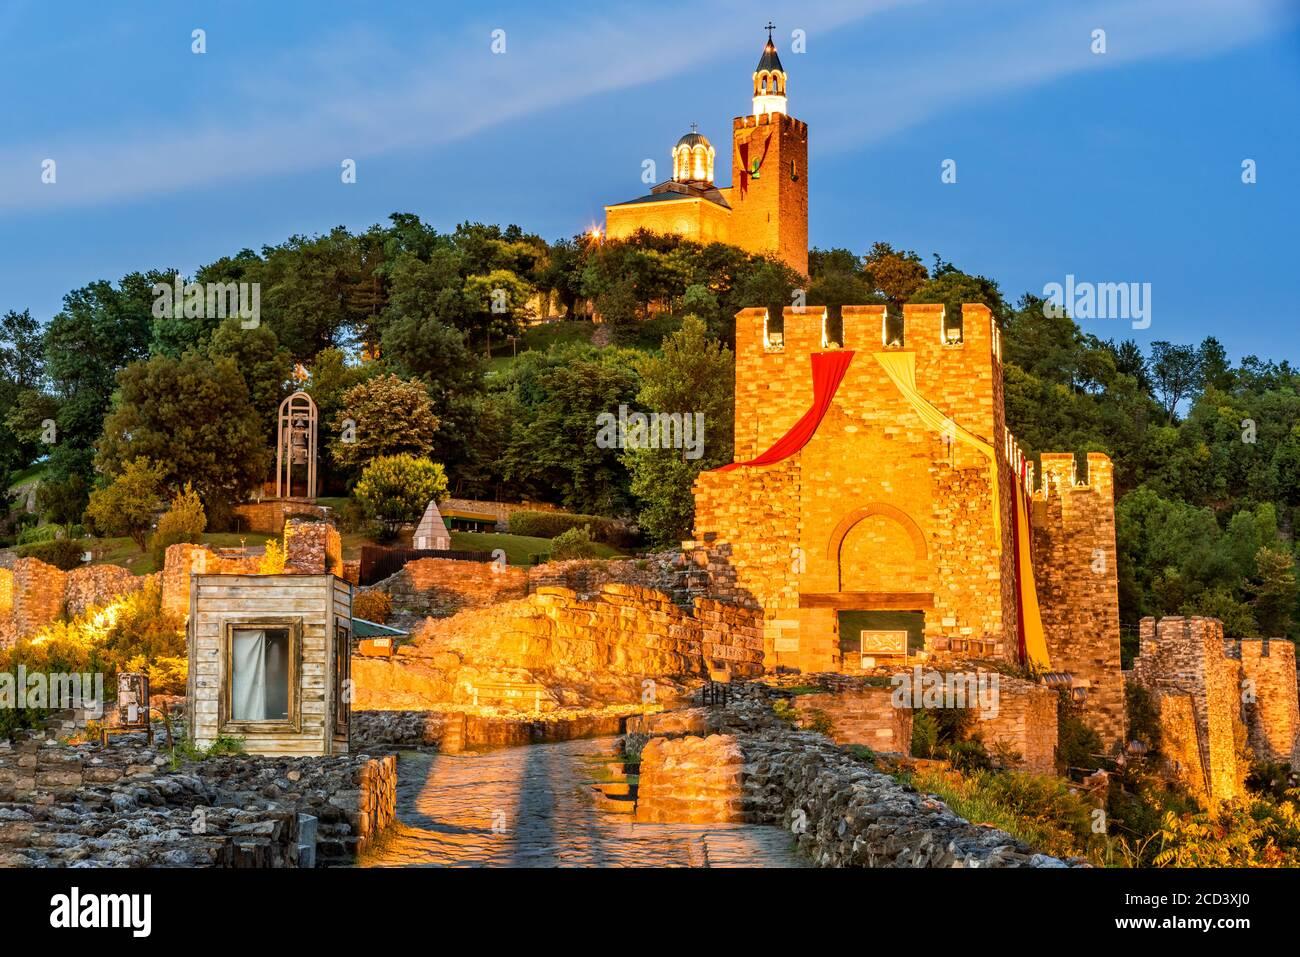 Veliko Tarnovo, Bulgaria. Tsarevets Fortress in in a beautiful summer blue hour light. Stock Photo